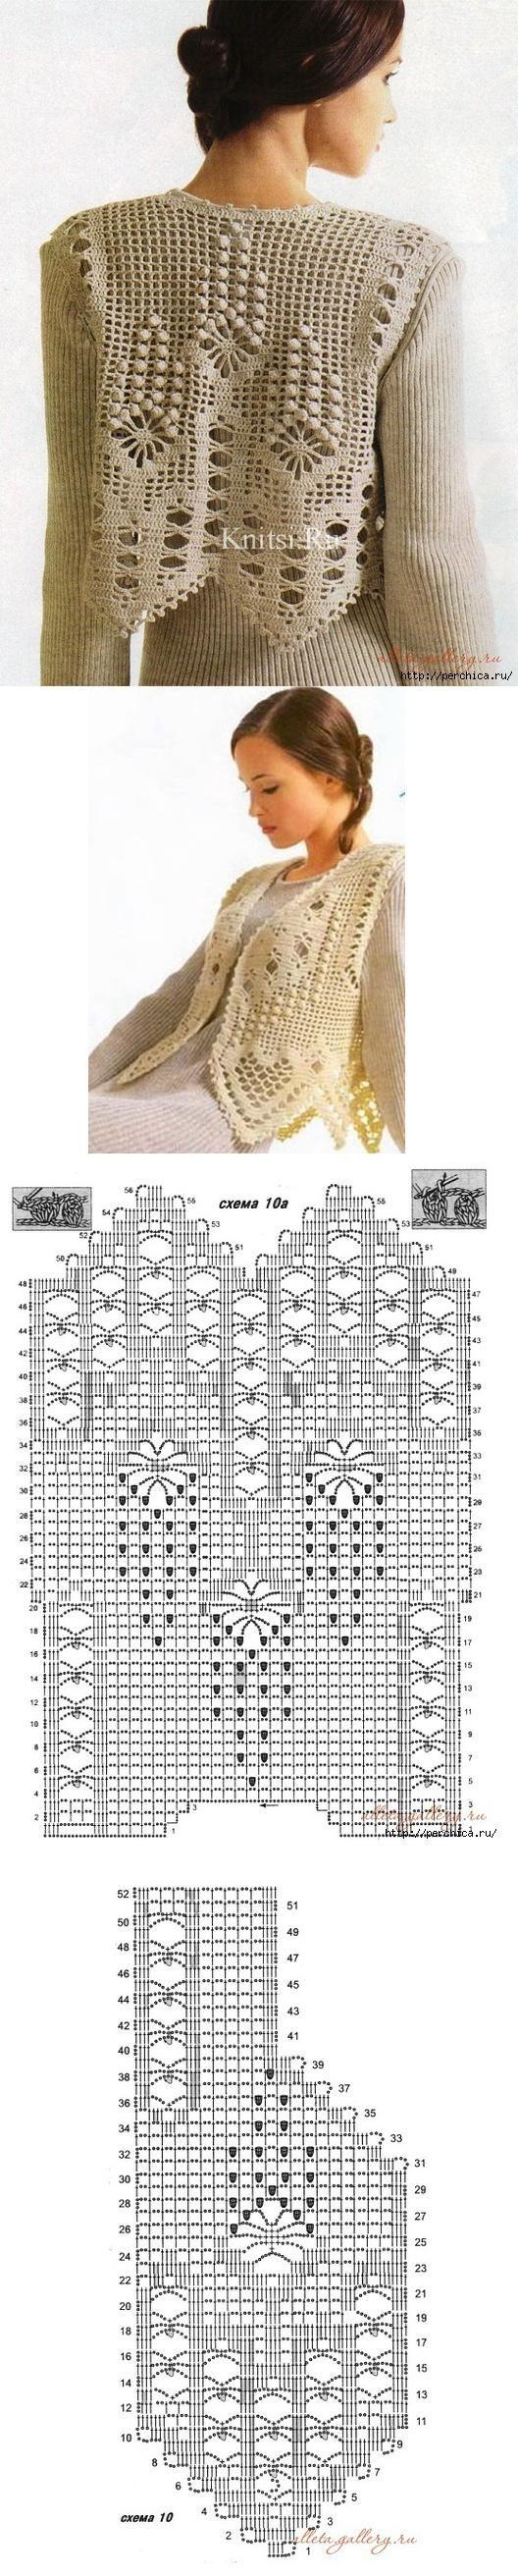 Crochet Inspiration pattern